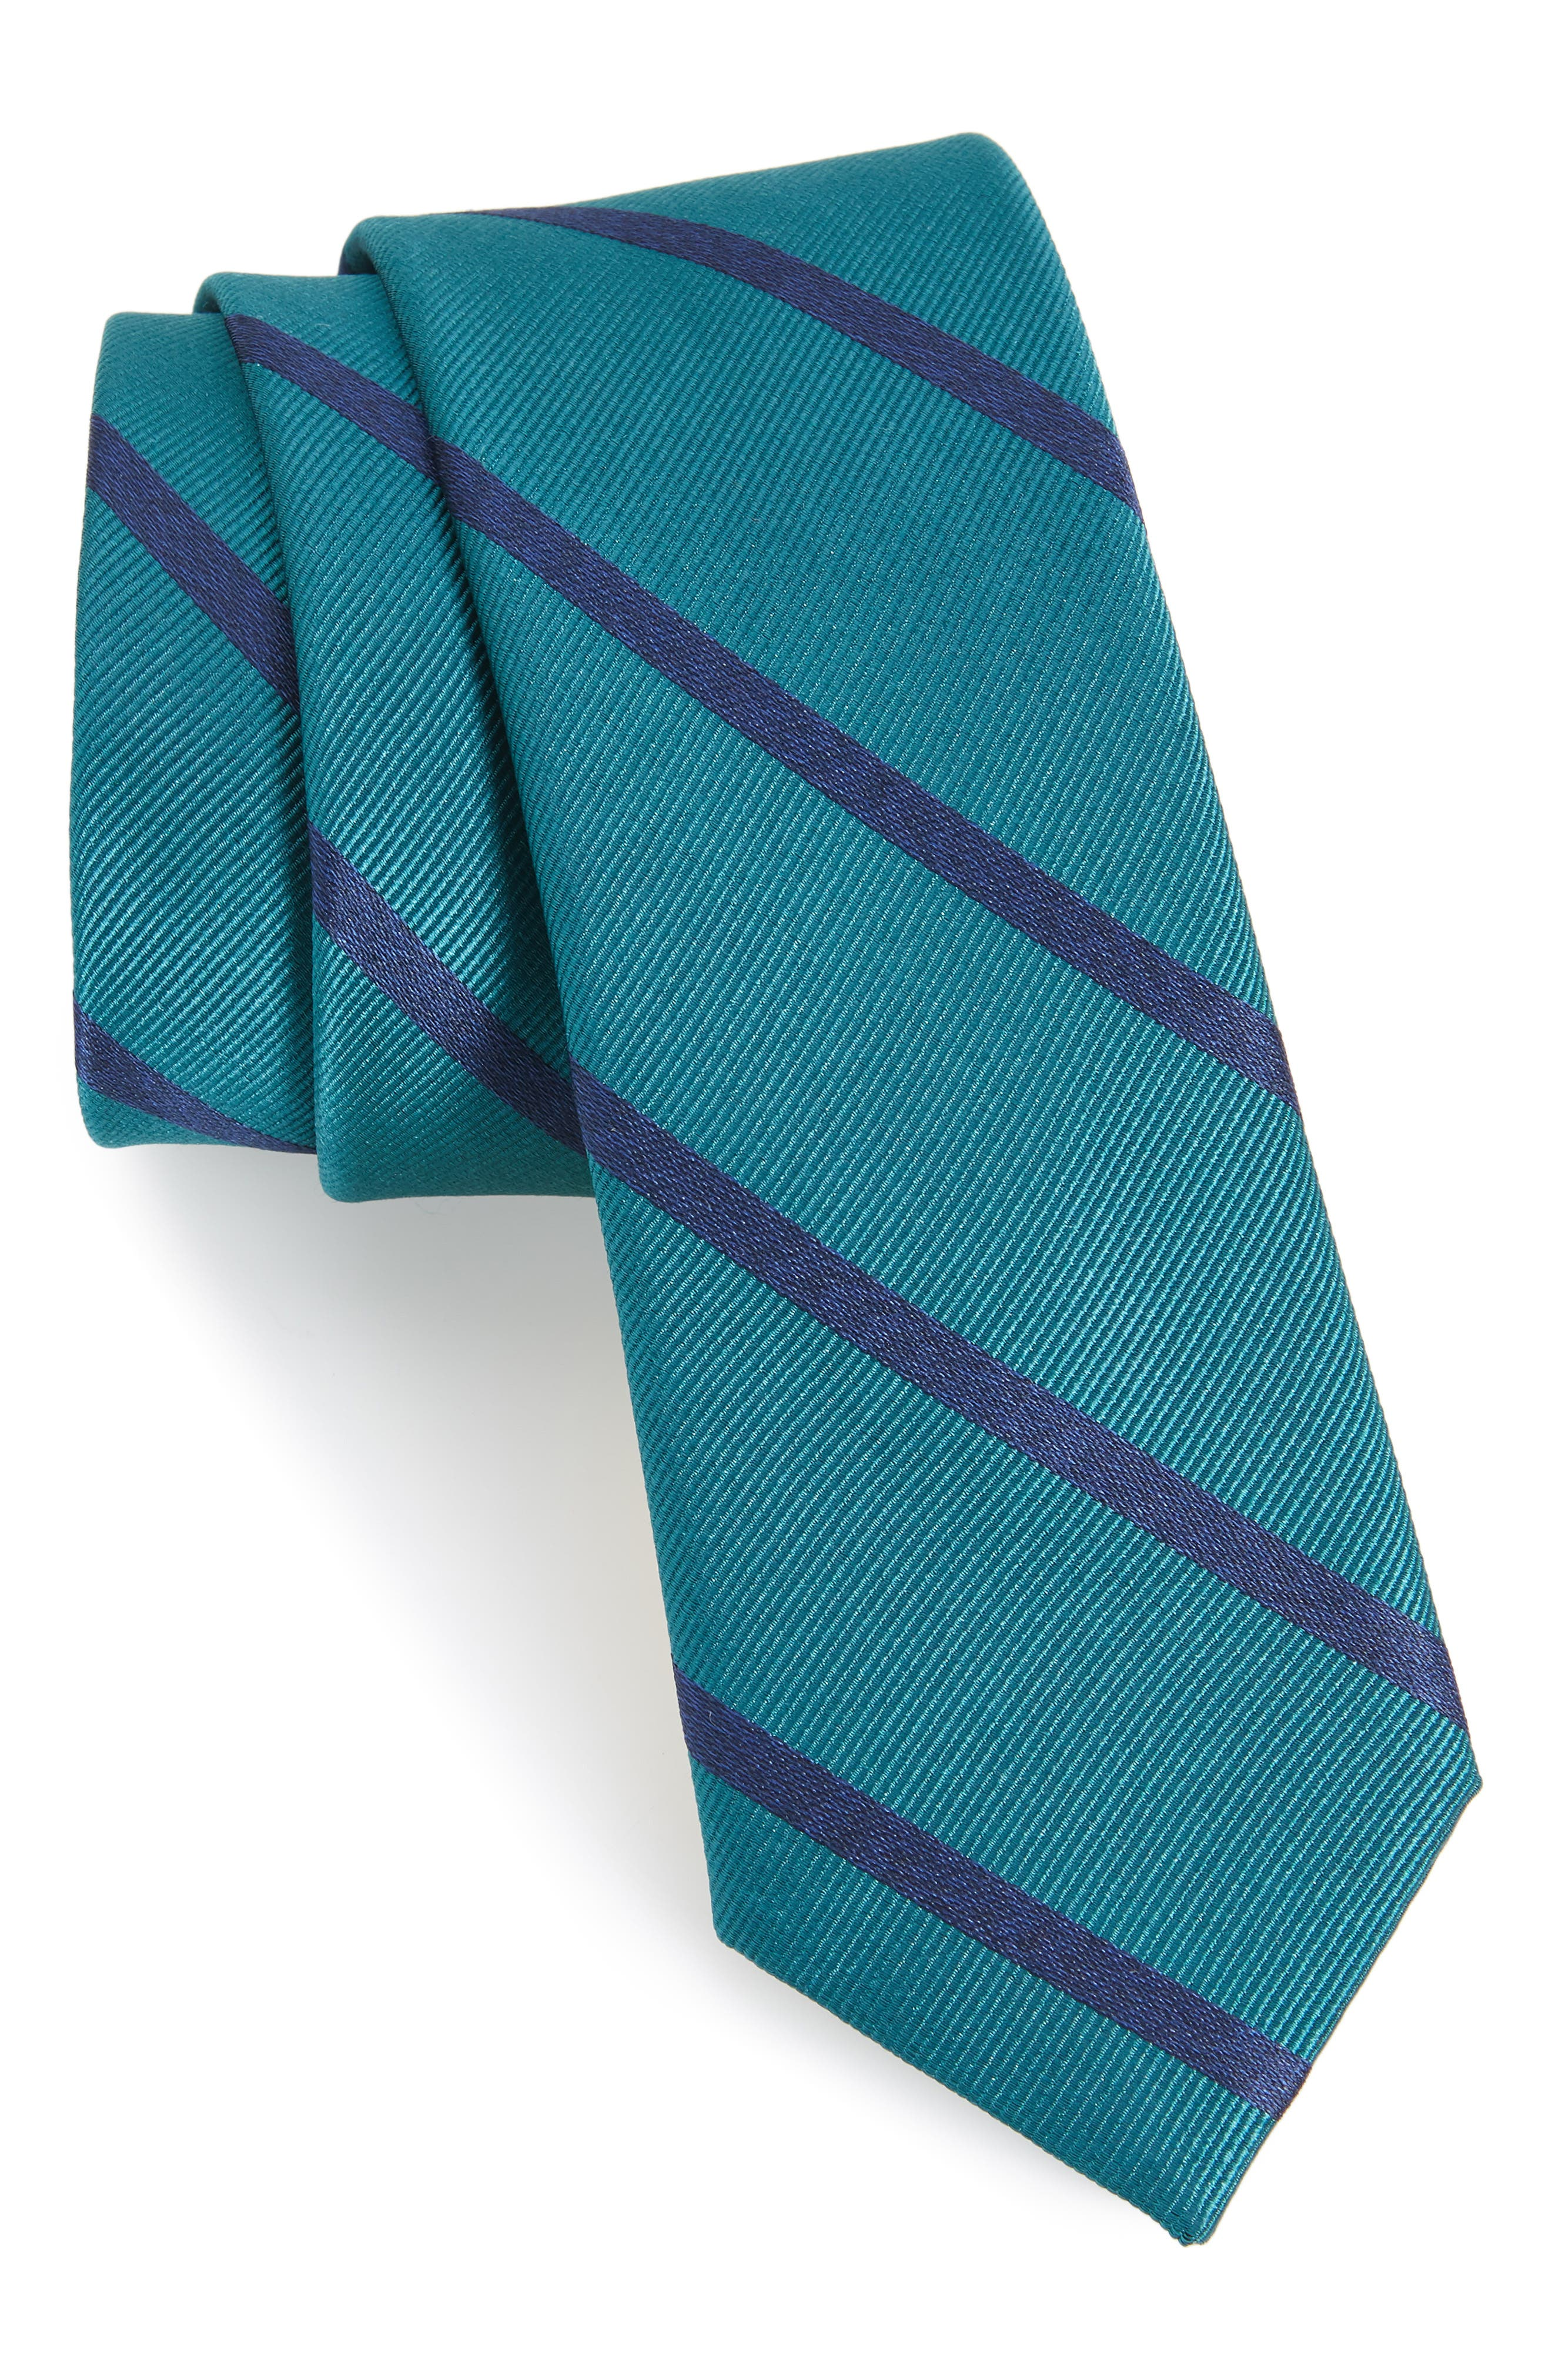 Wheelhouse Stripe Silk Skinny Tie,                         Main,                         color, TEAL